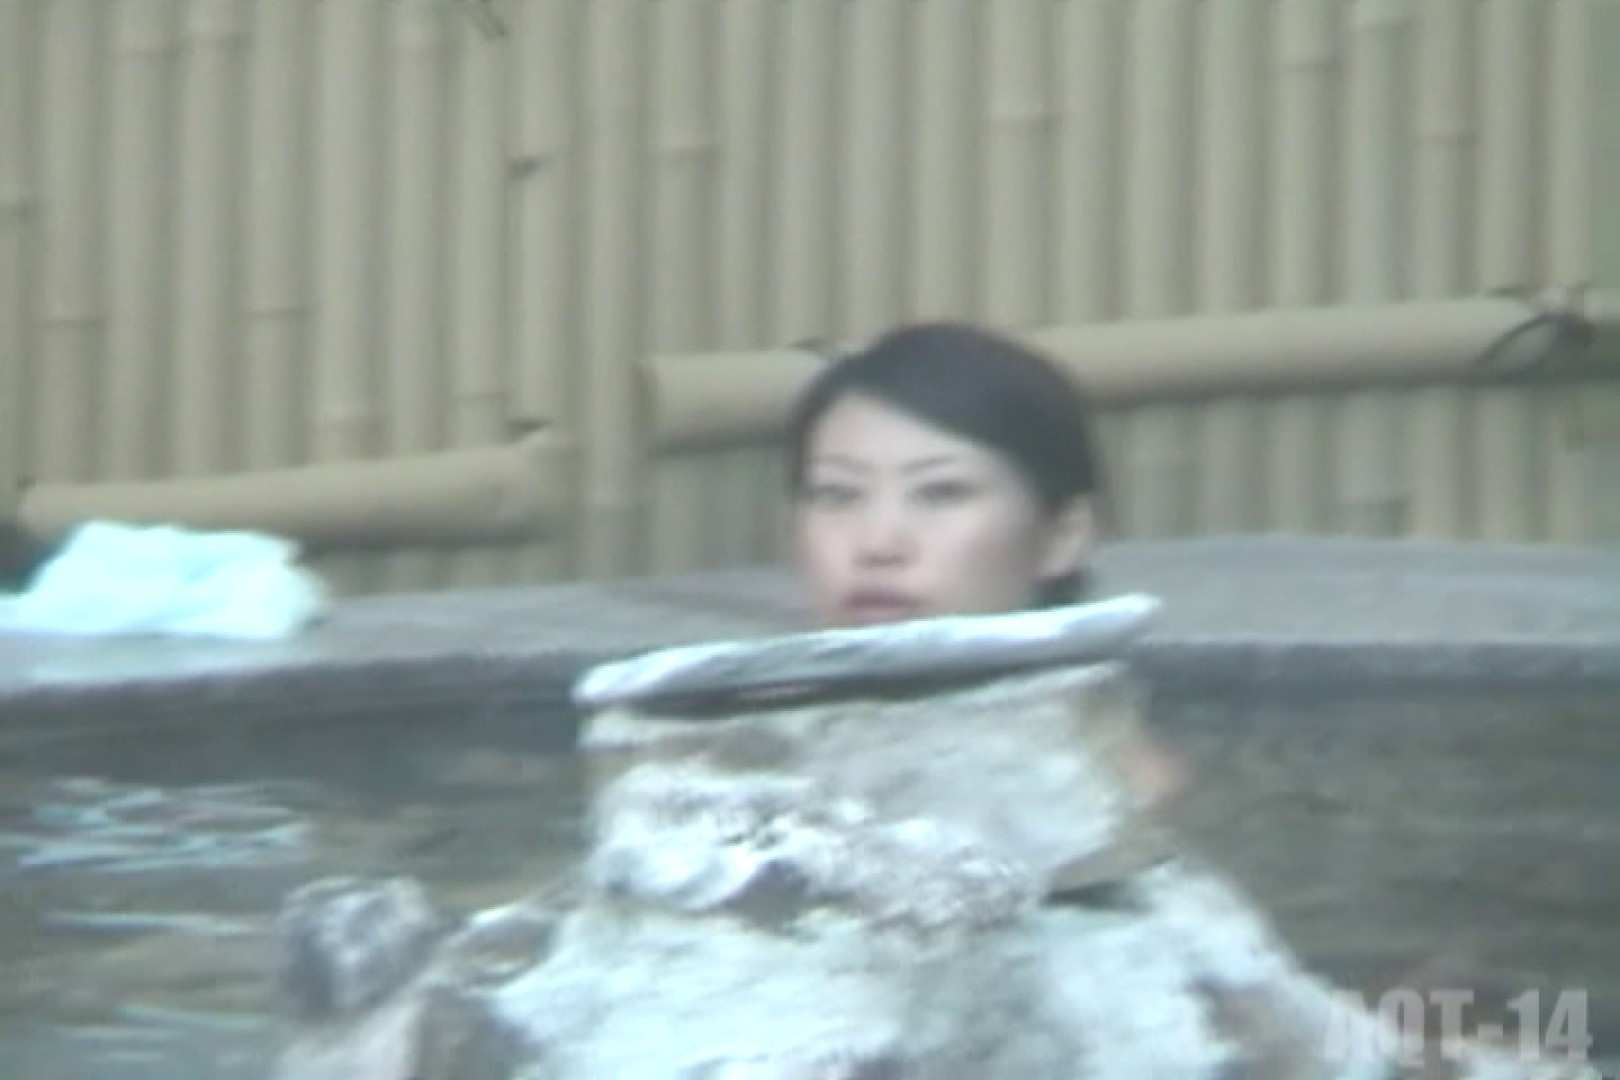 Aquaな露天風呂Vol.820 盗撮シリーズ | 露天風呂編  93PIX 3